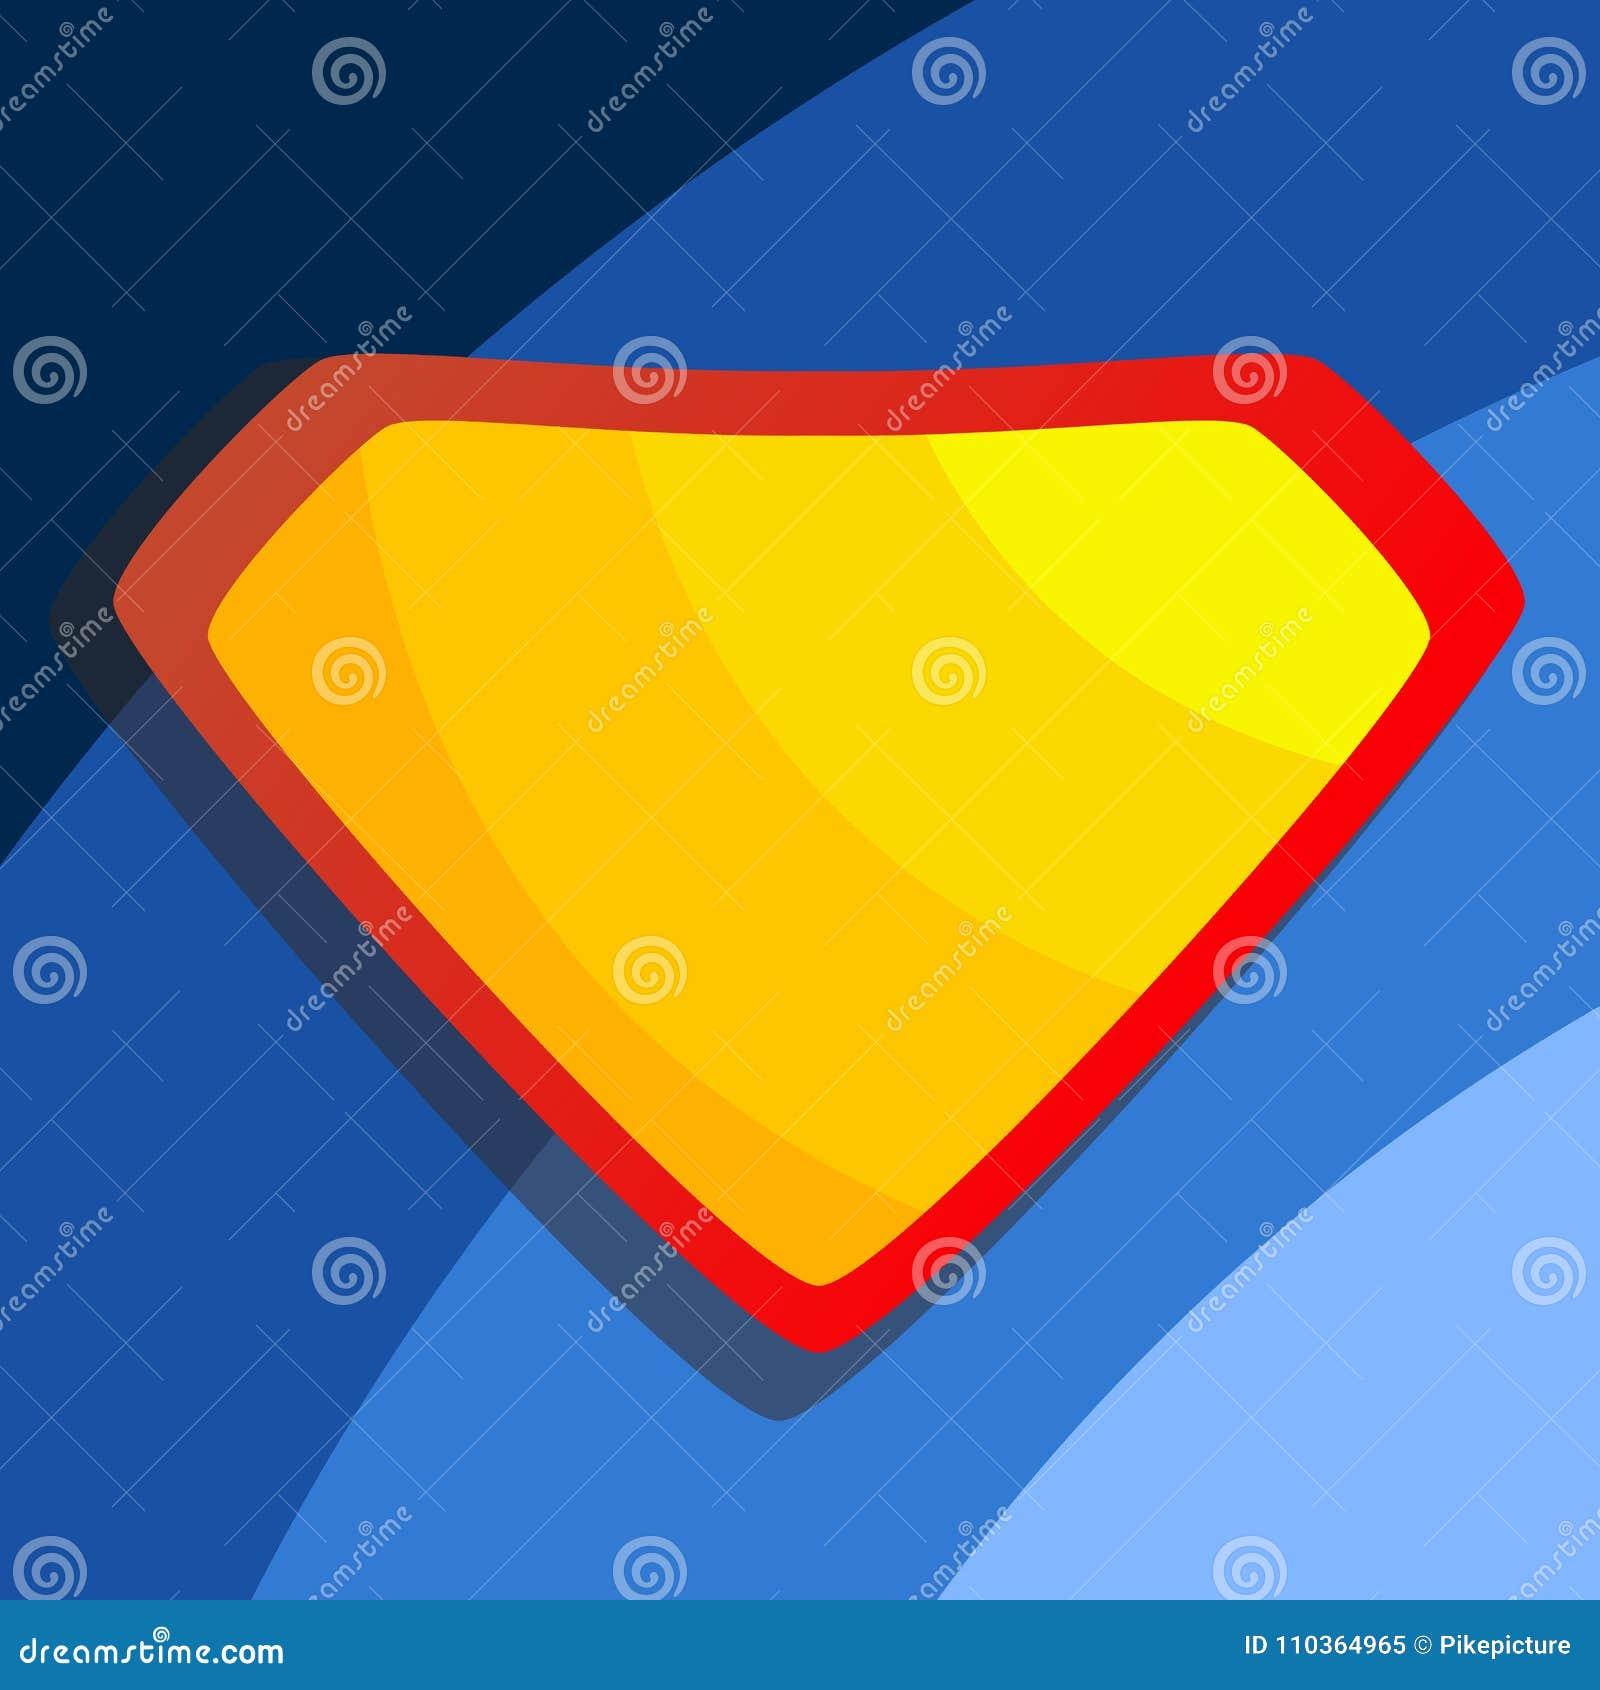 Superhero Logo Vector. Yellow, Red Shield. Emblem Template. Flat ...